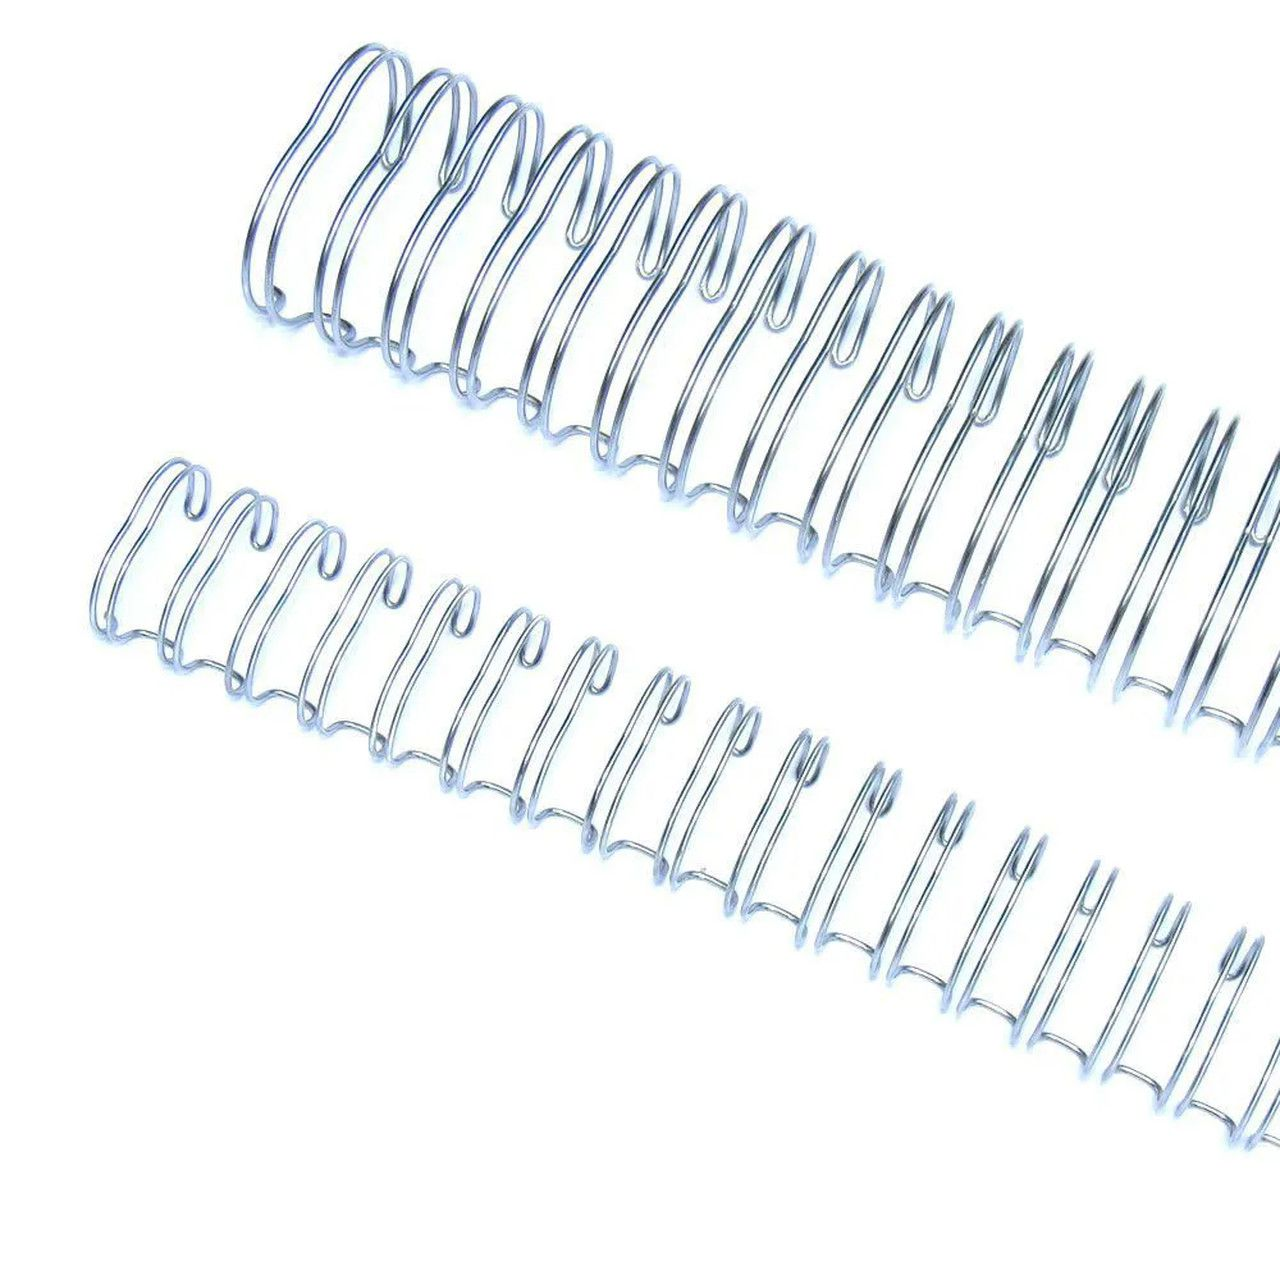 "Wire-o 1/4"" para 20 fls Ofício 3x1 Prata/Silver 100 und"